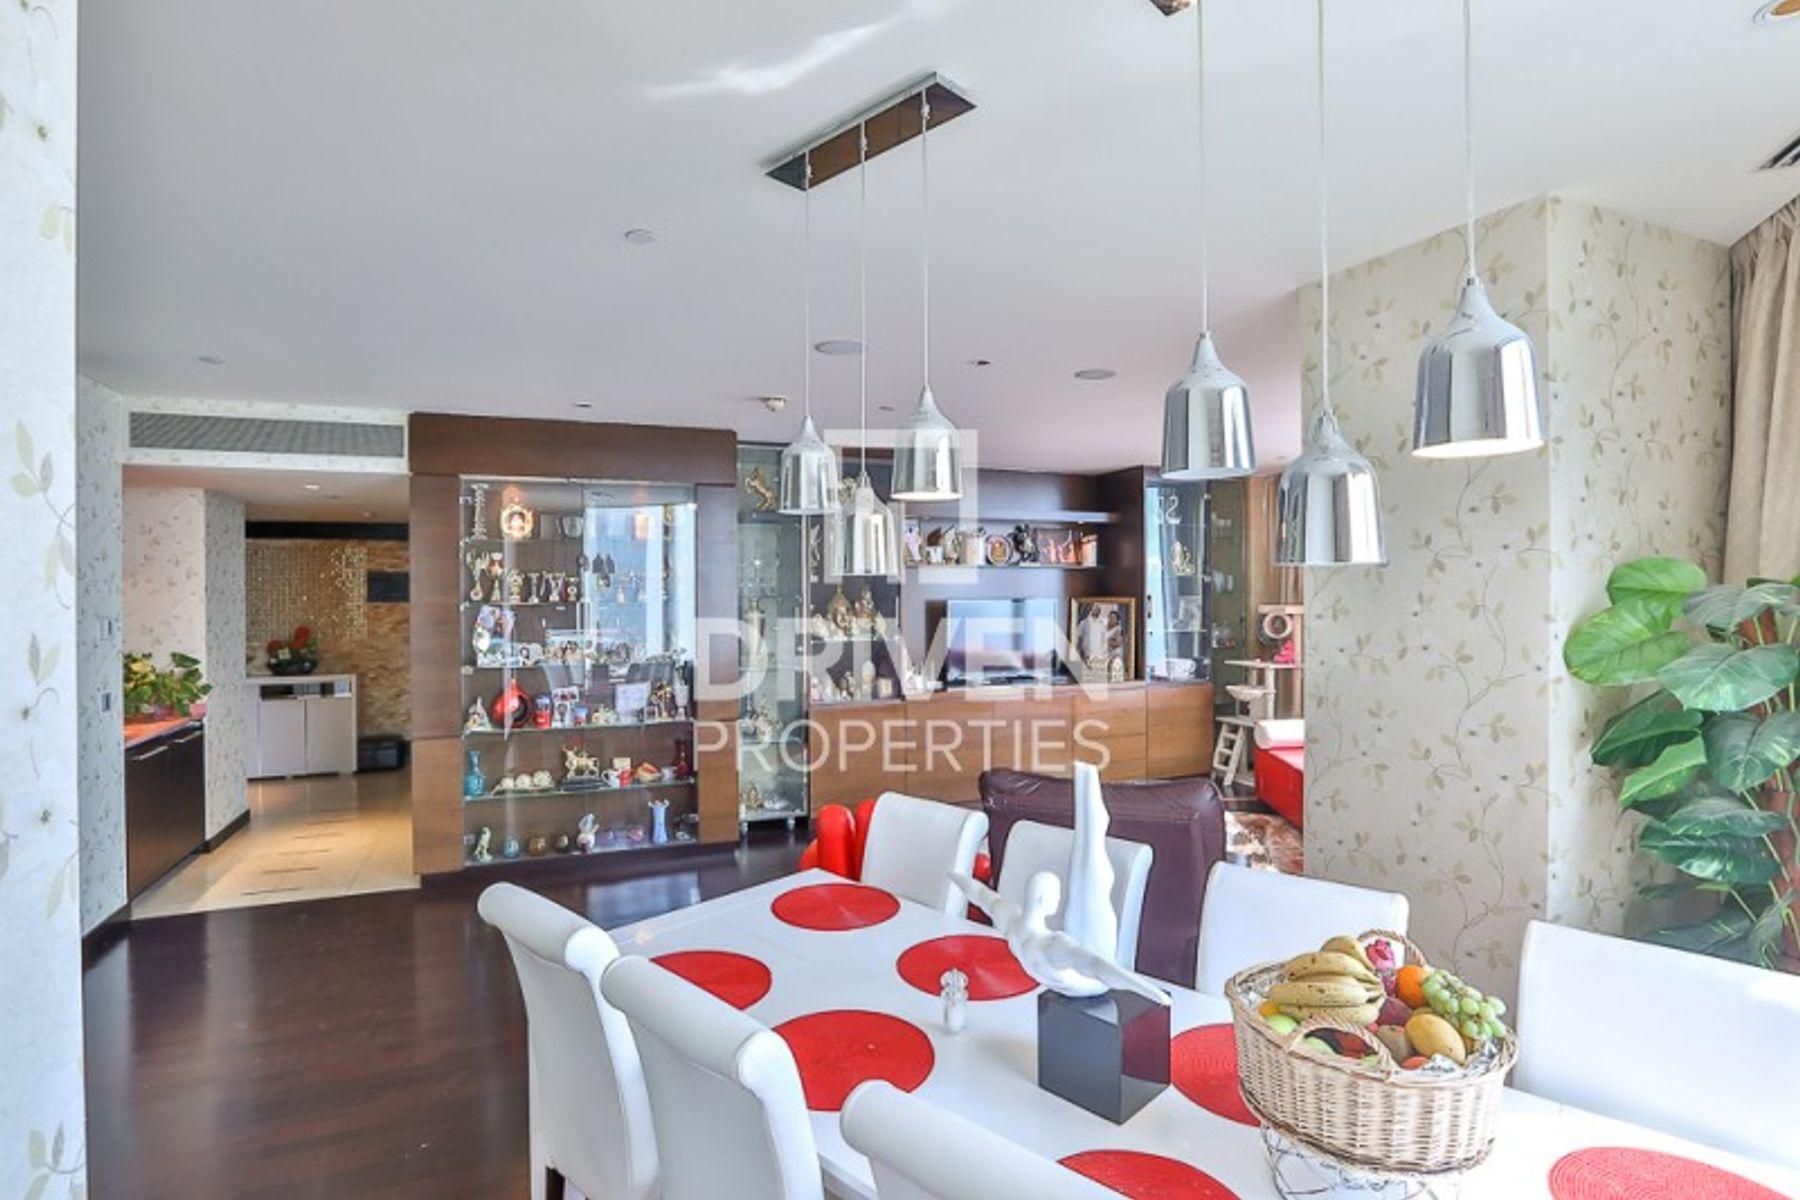 Apartment for Sale in Burj Khalifa, Downtown Dubai